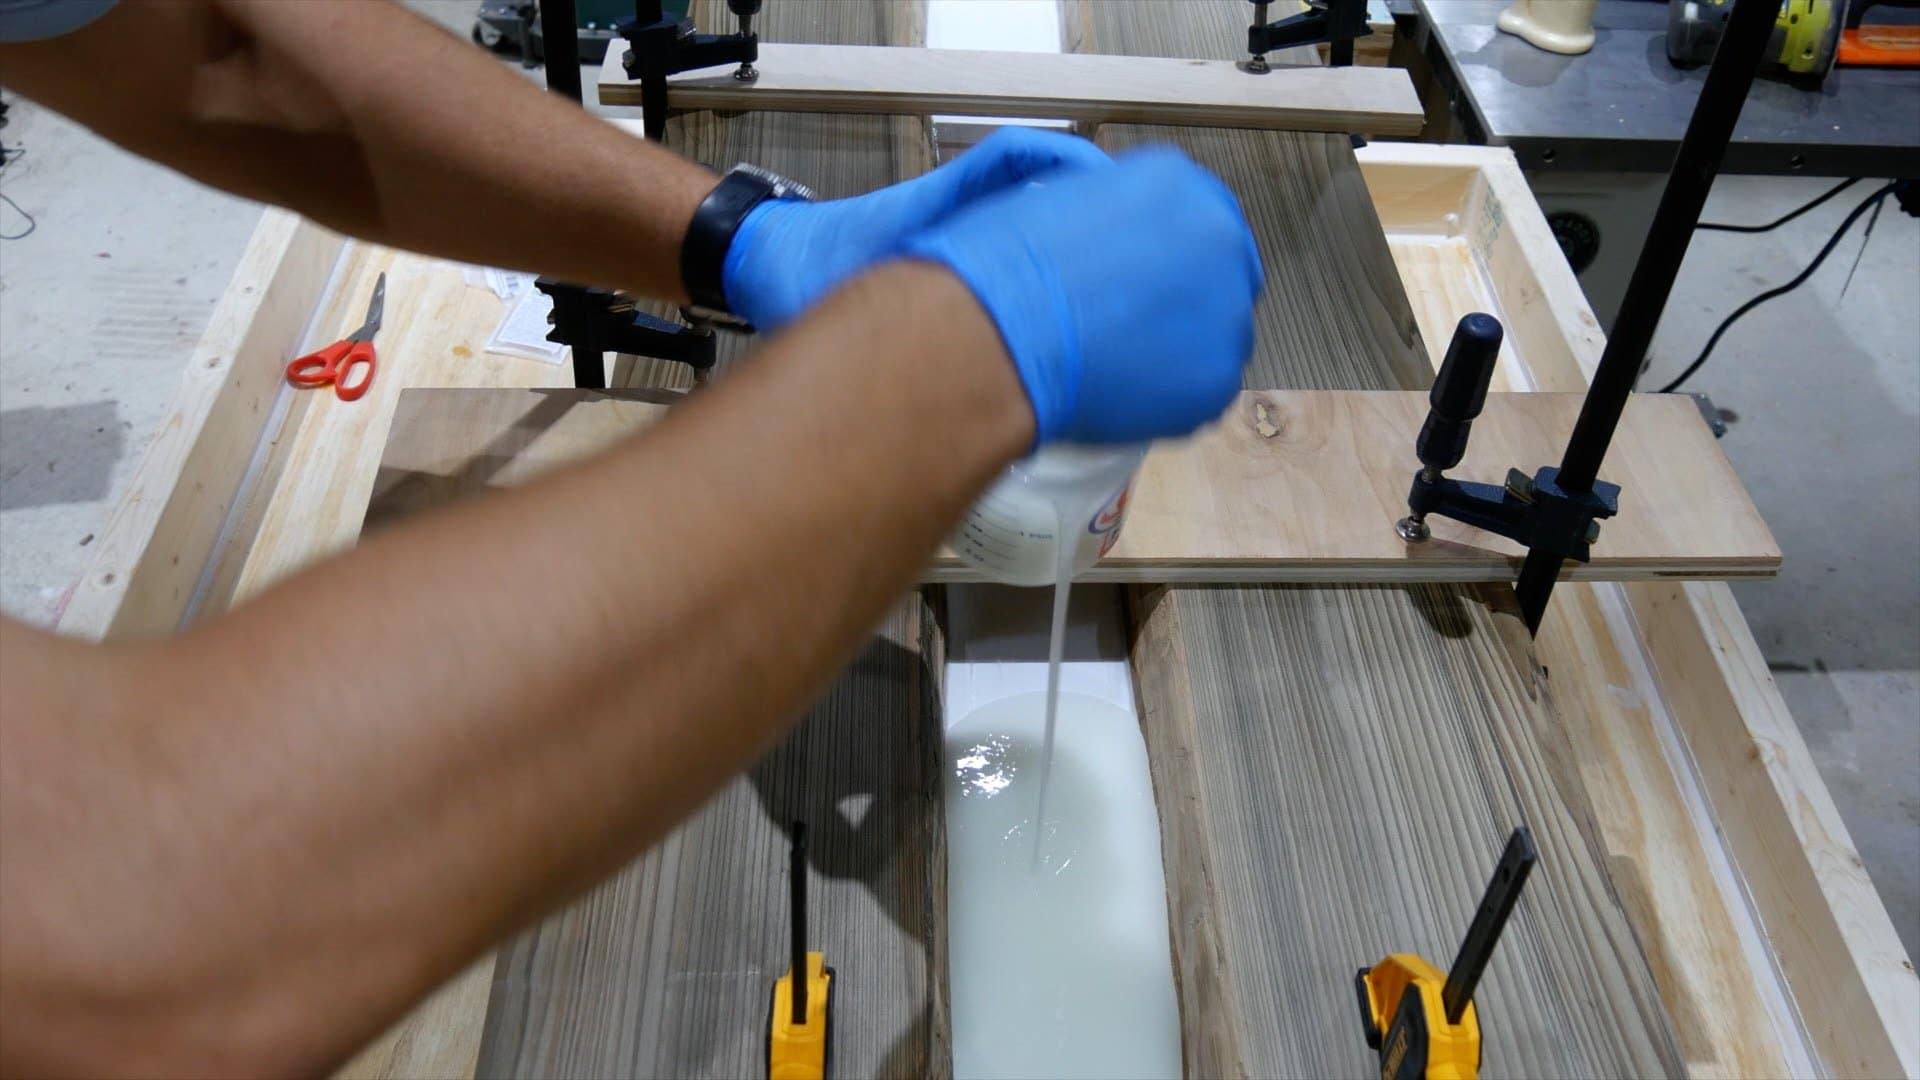 epoxy-resin-river-table-glowpowder_20171016_23